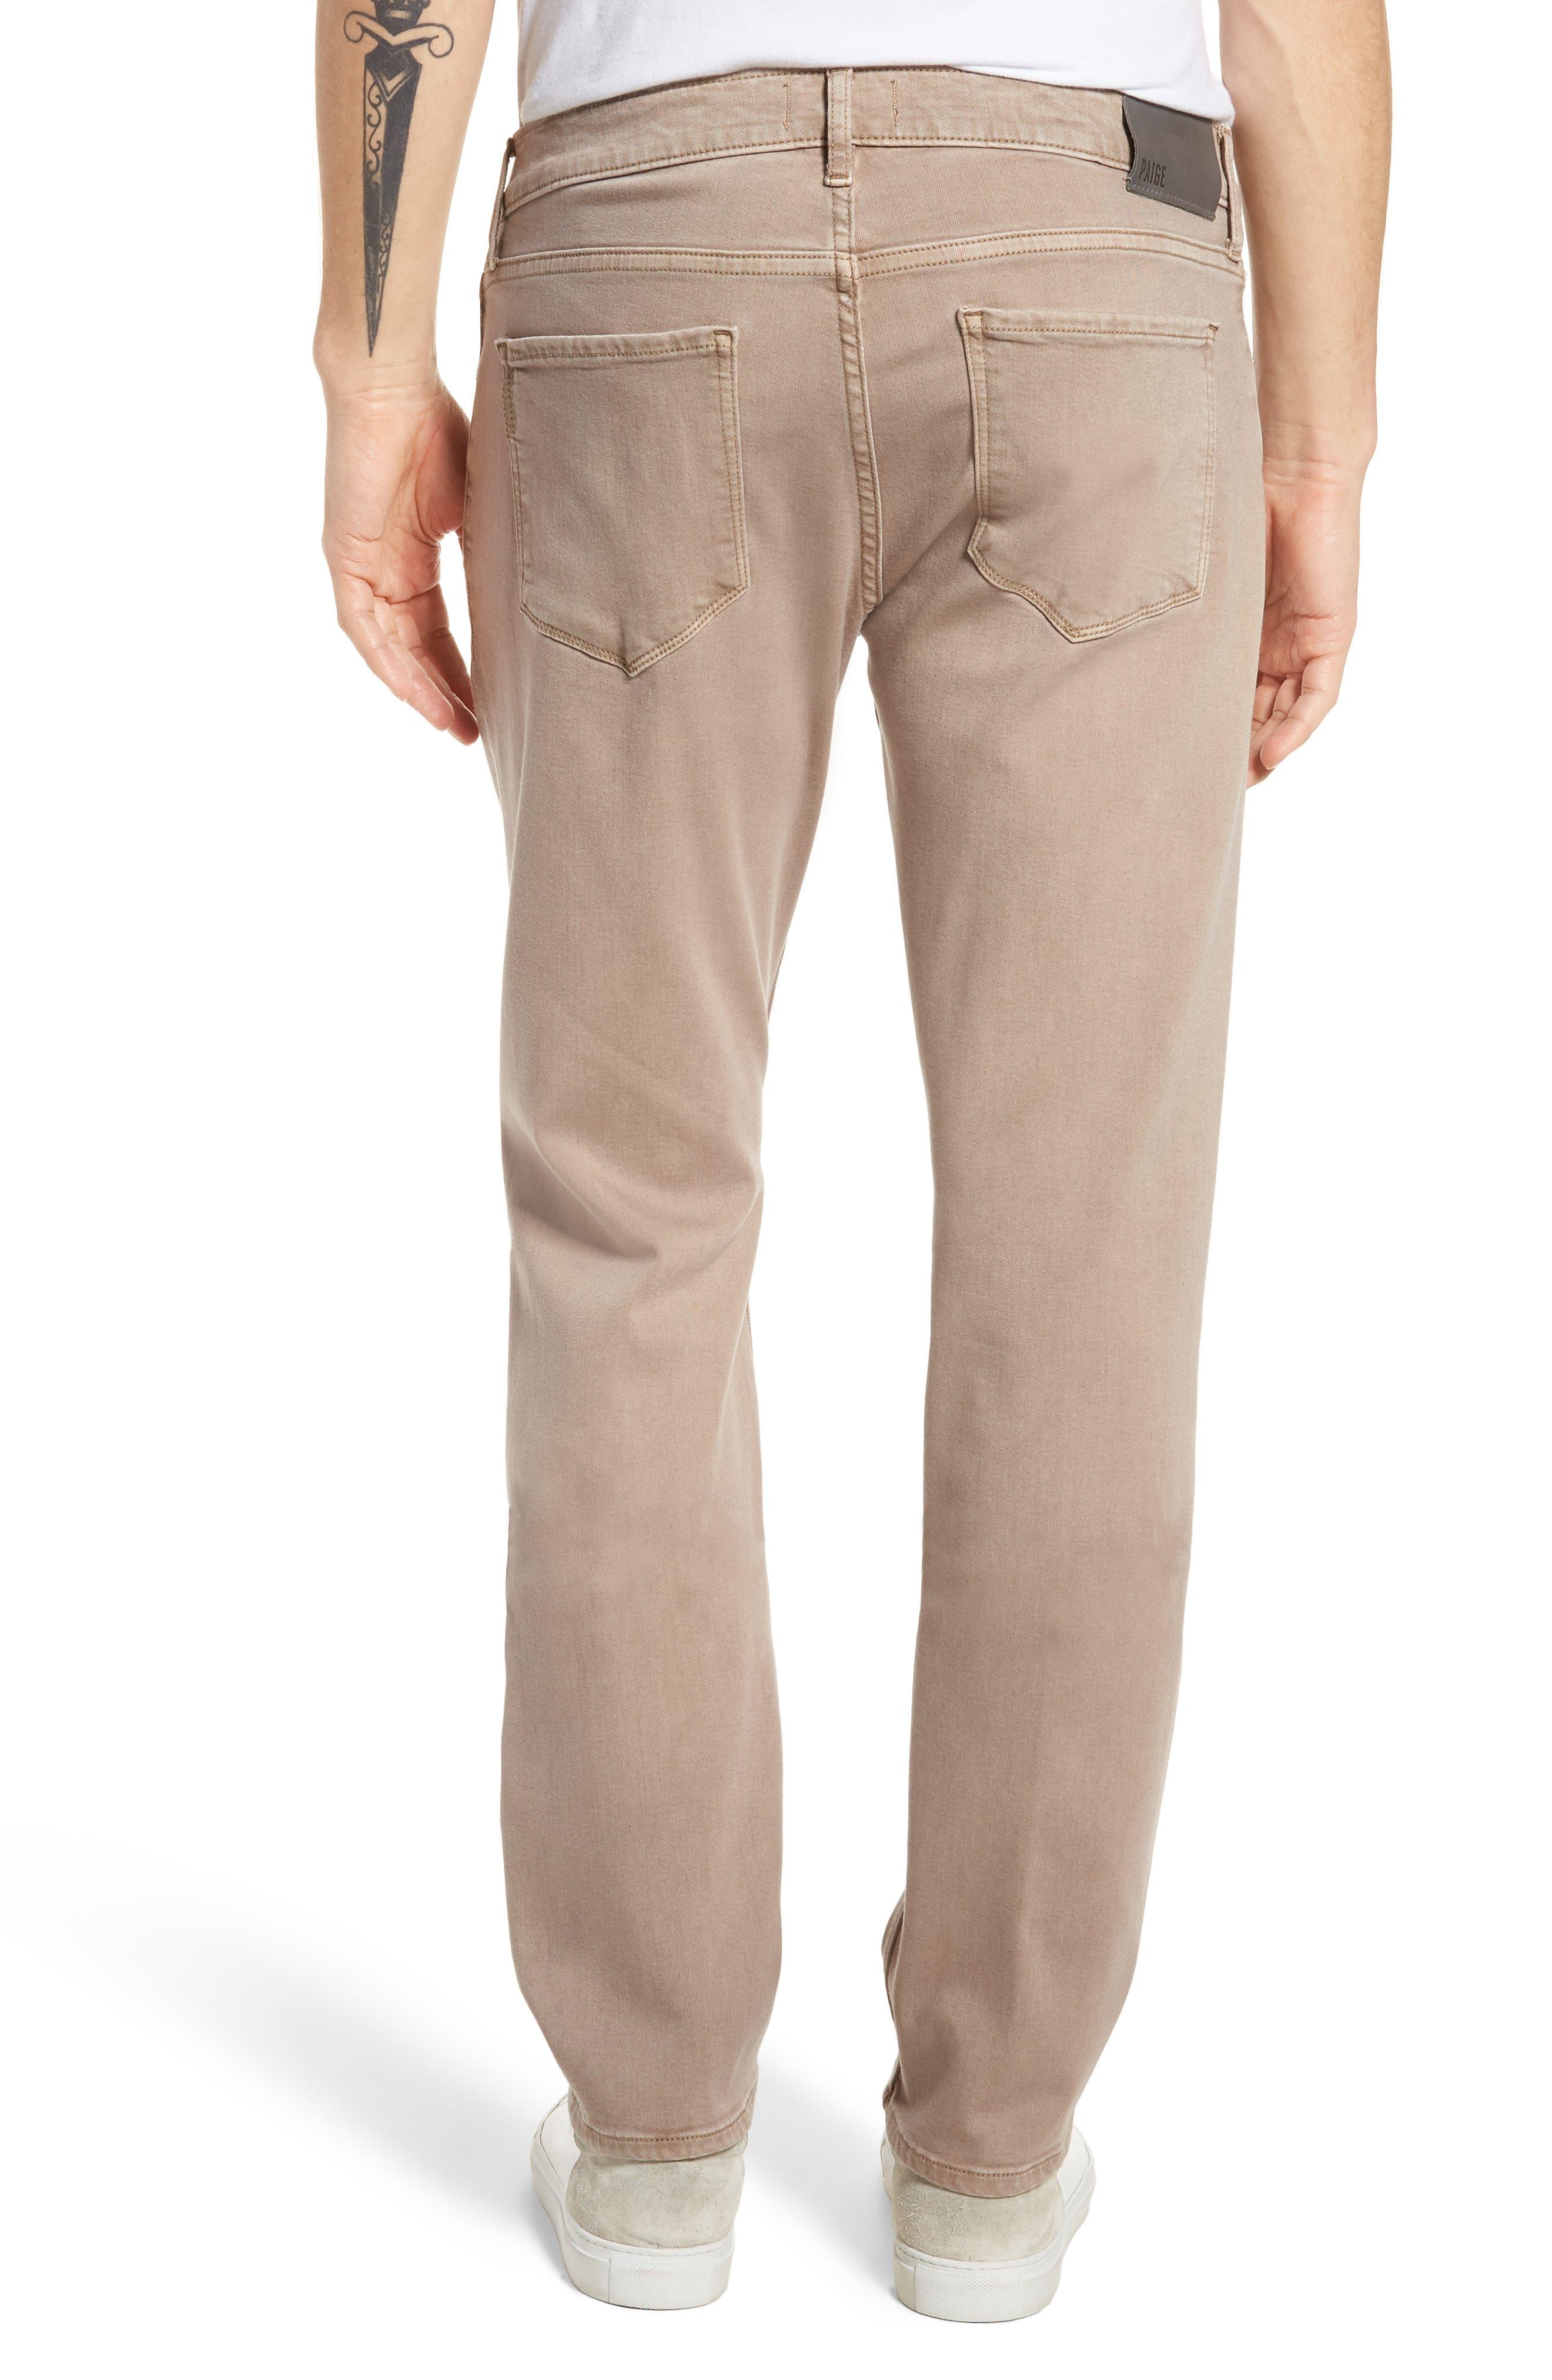 PAIGE,                             Federal Slim Straight Leg Jeans,                             Alternate thumbnail 2, color,                             250